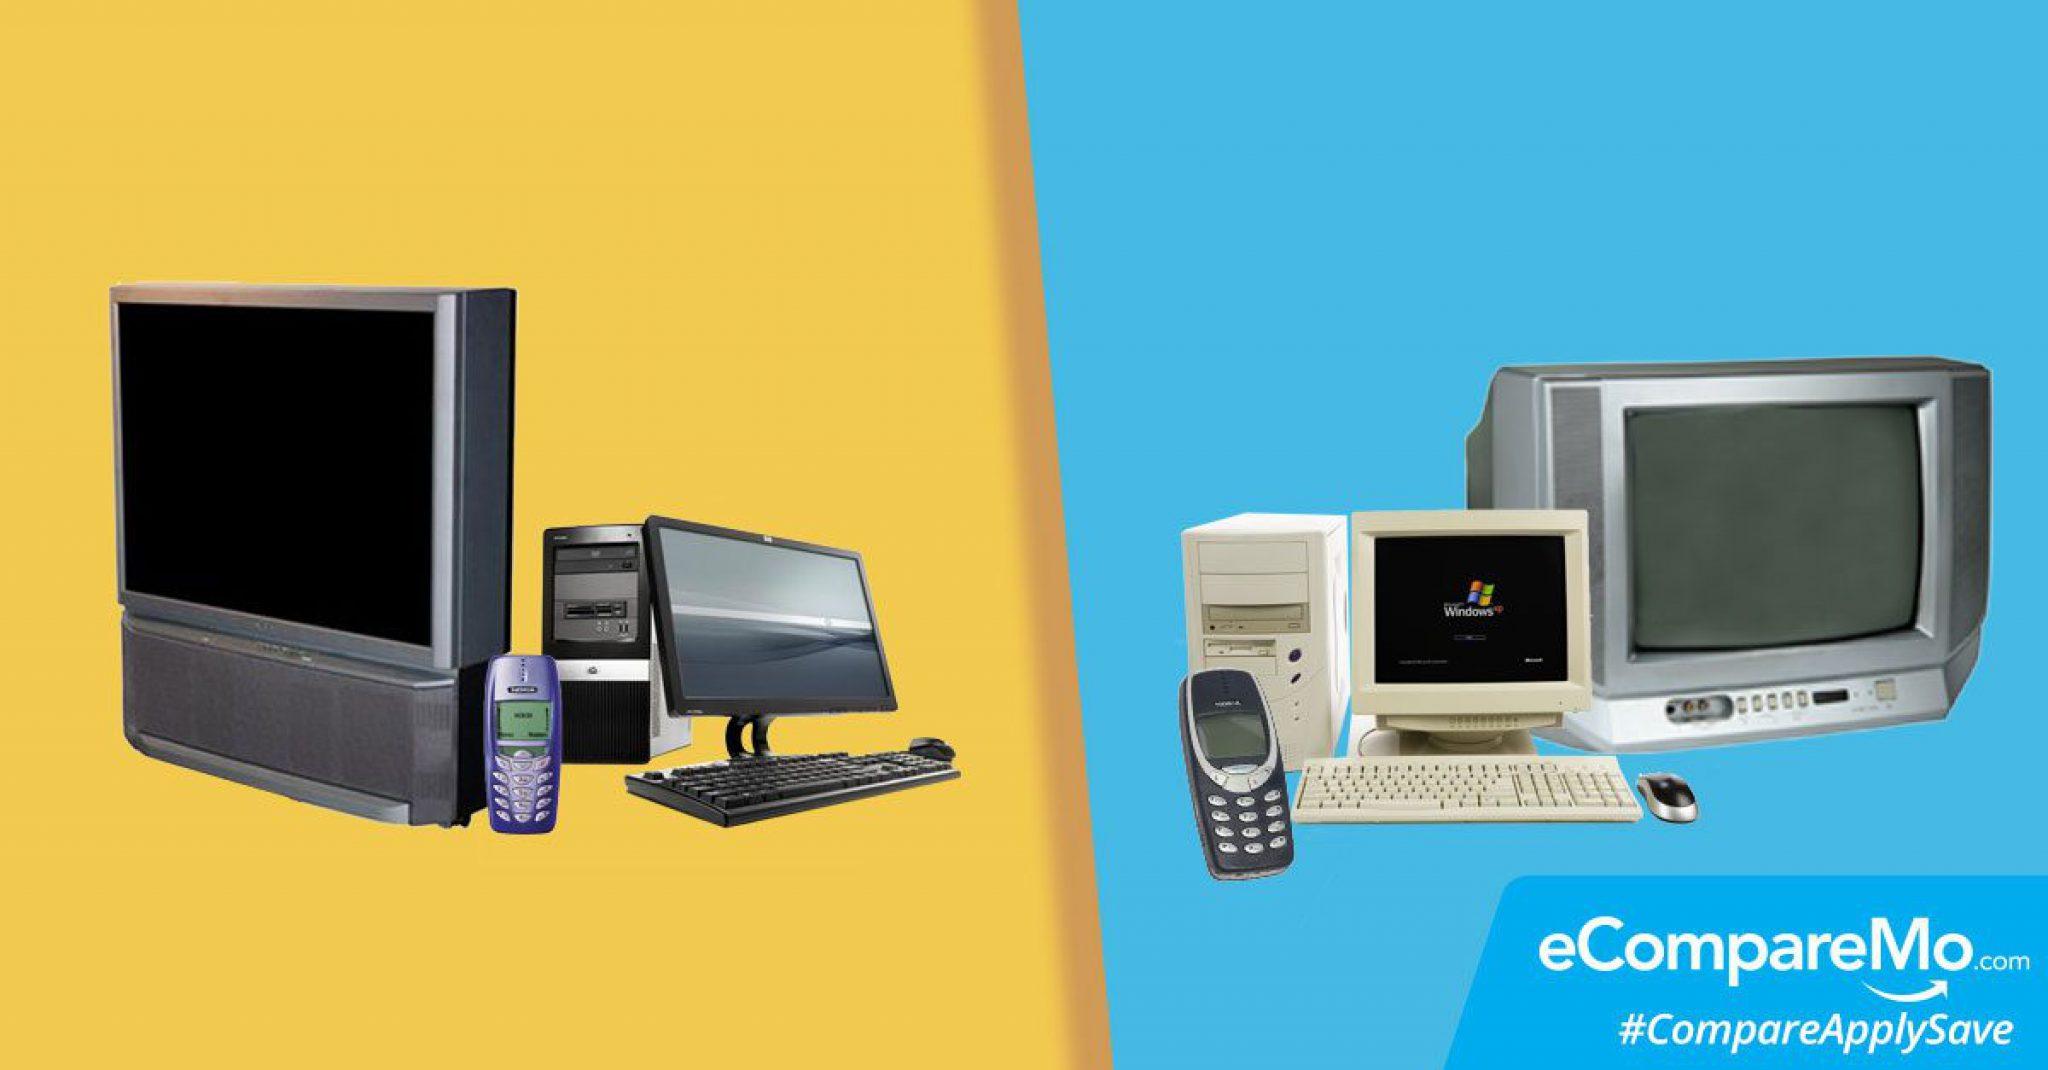 citibank secured credit card application online